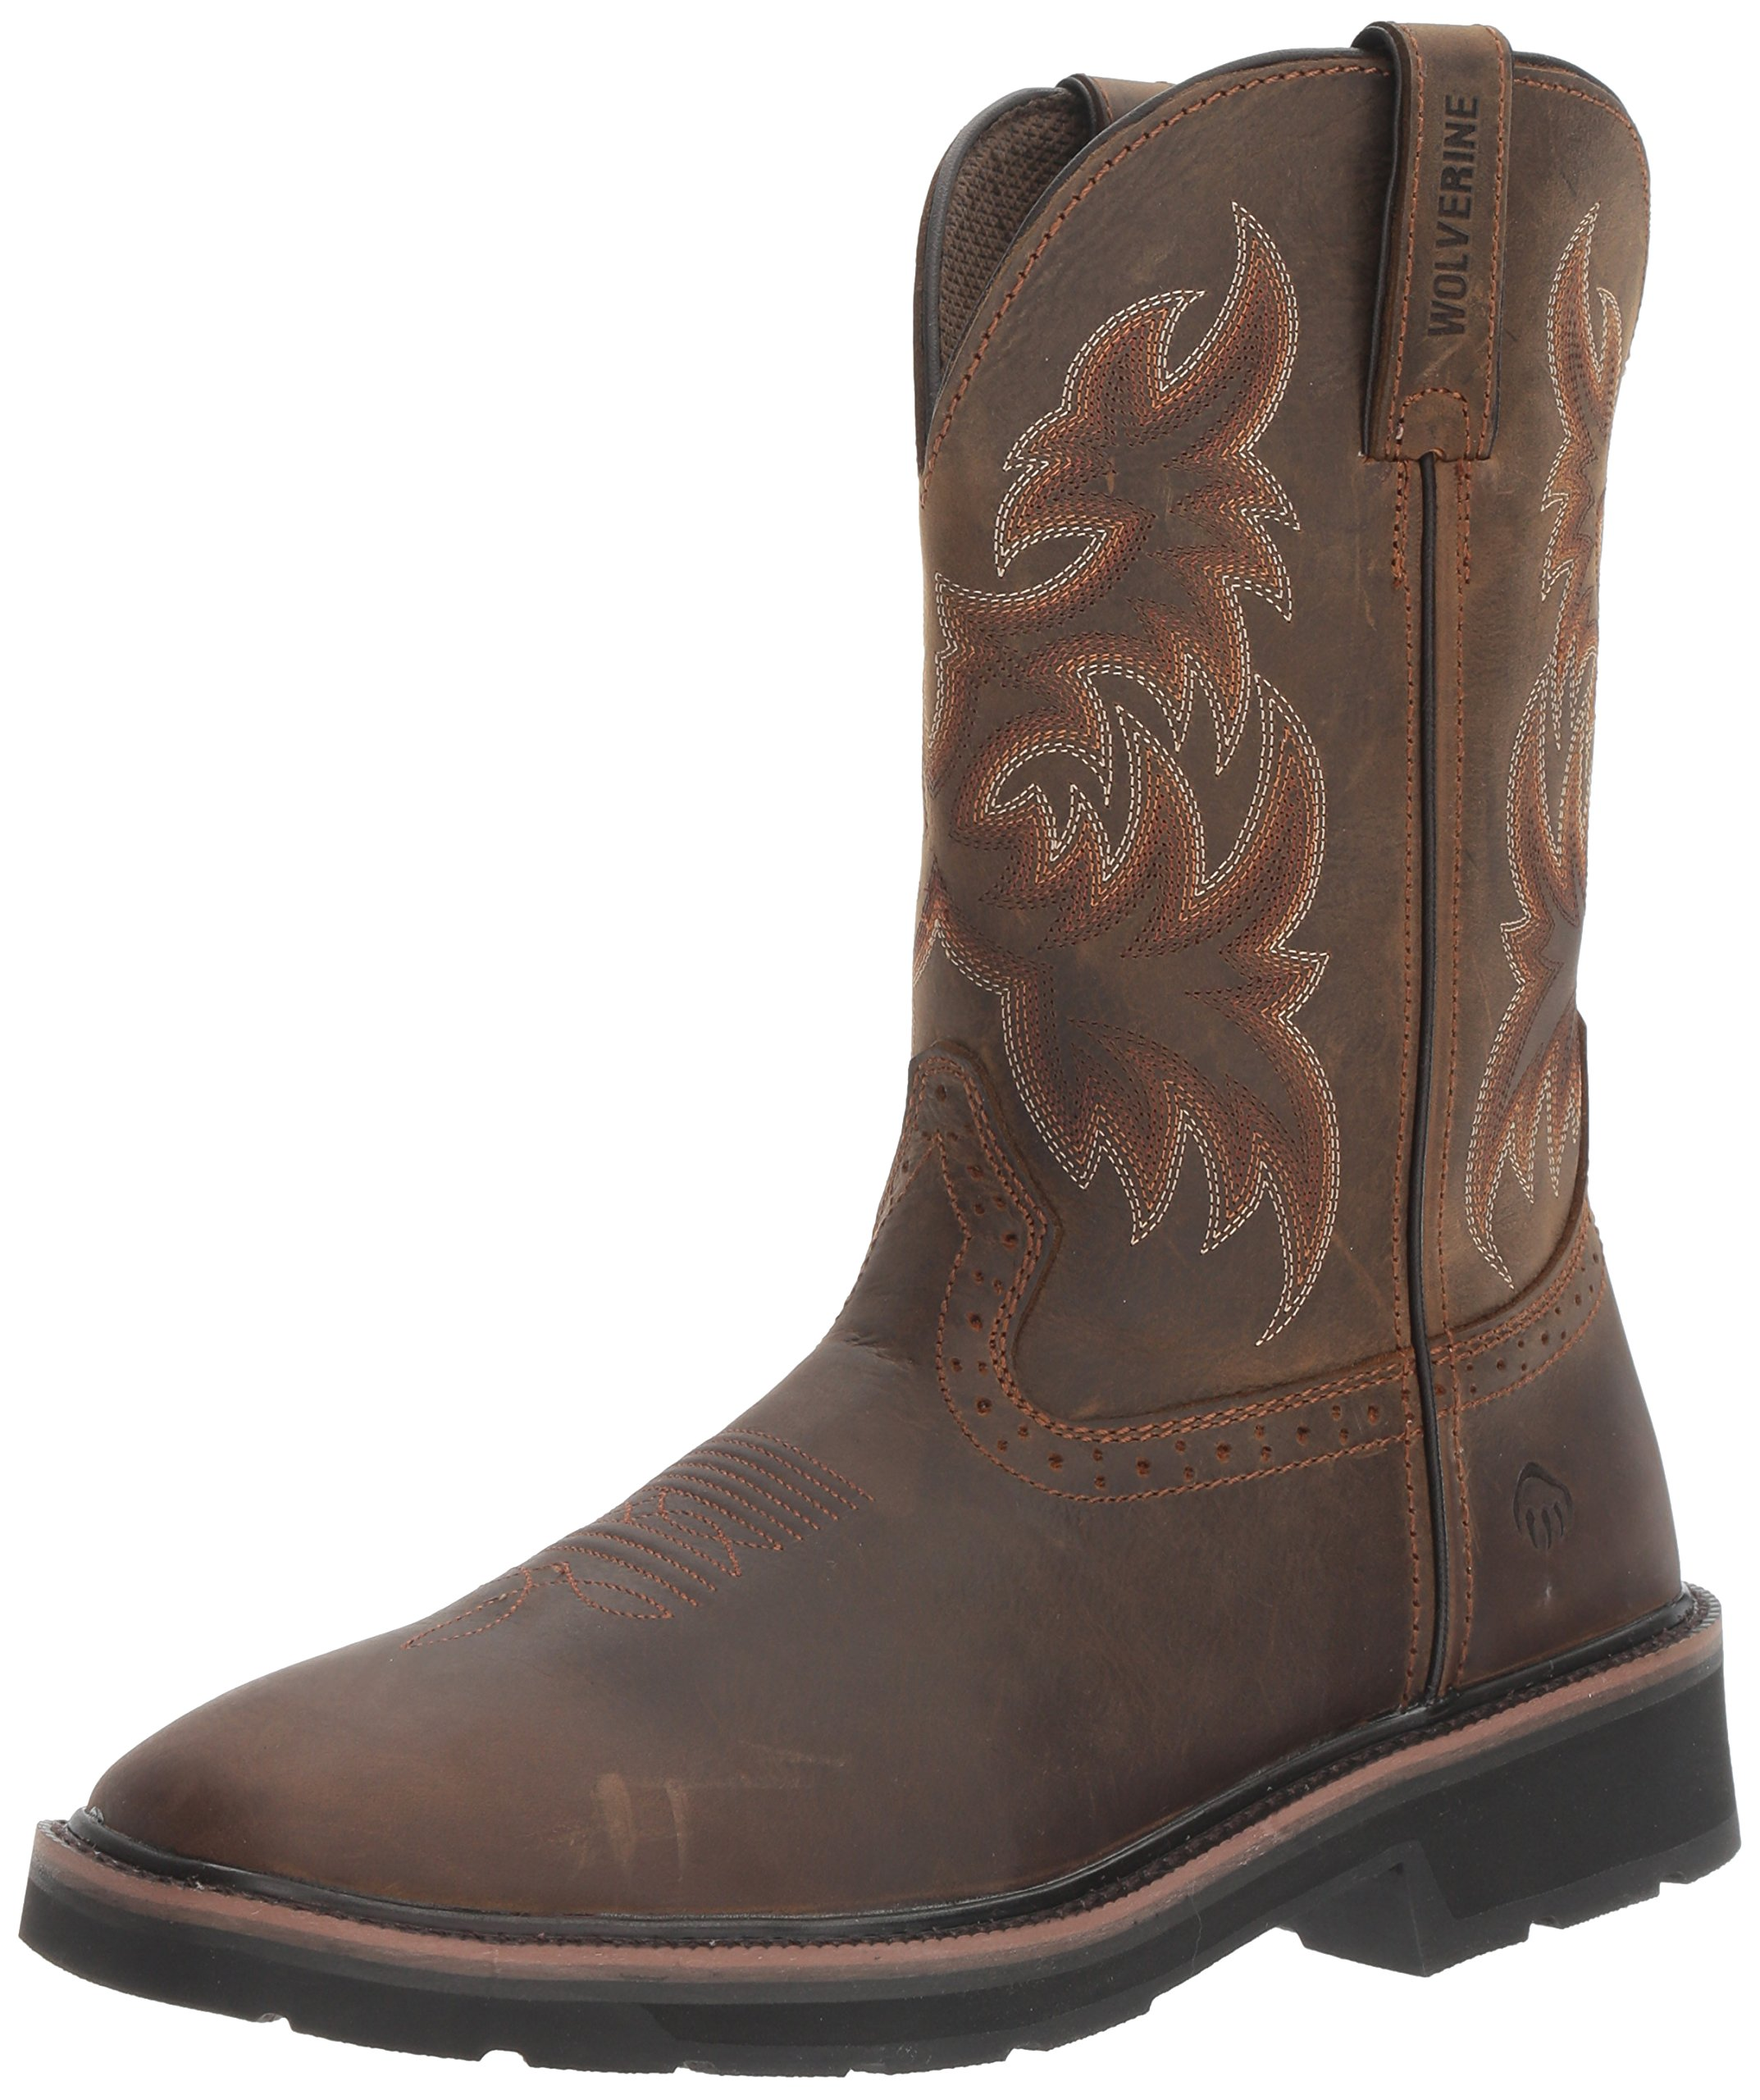 Wolverine Men's Rancher 10'' Square Soft Toe Work Boot, Dark Brown/Rust, 12 M US